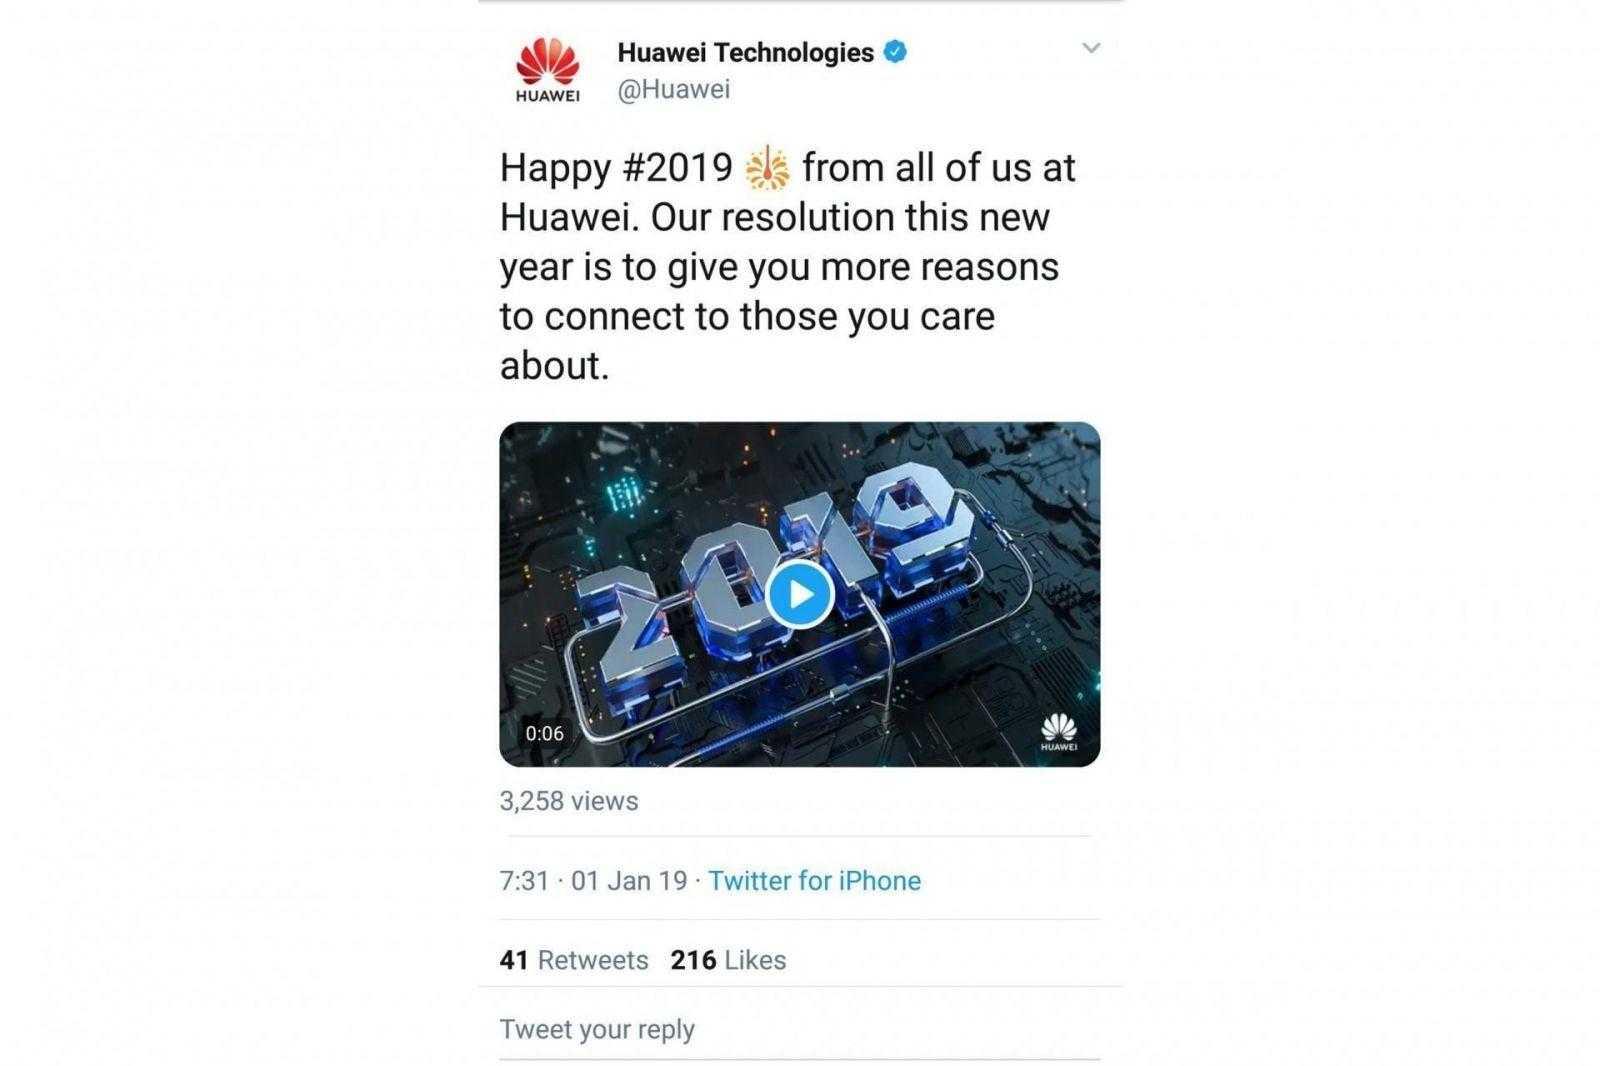 Huawei понизила в должности двух сотрудников и сократила их зарплату за пост с iPhone (huawei nye tweet)